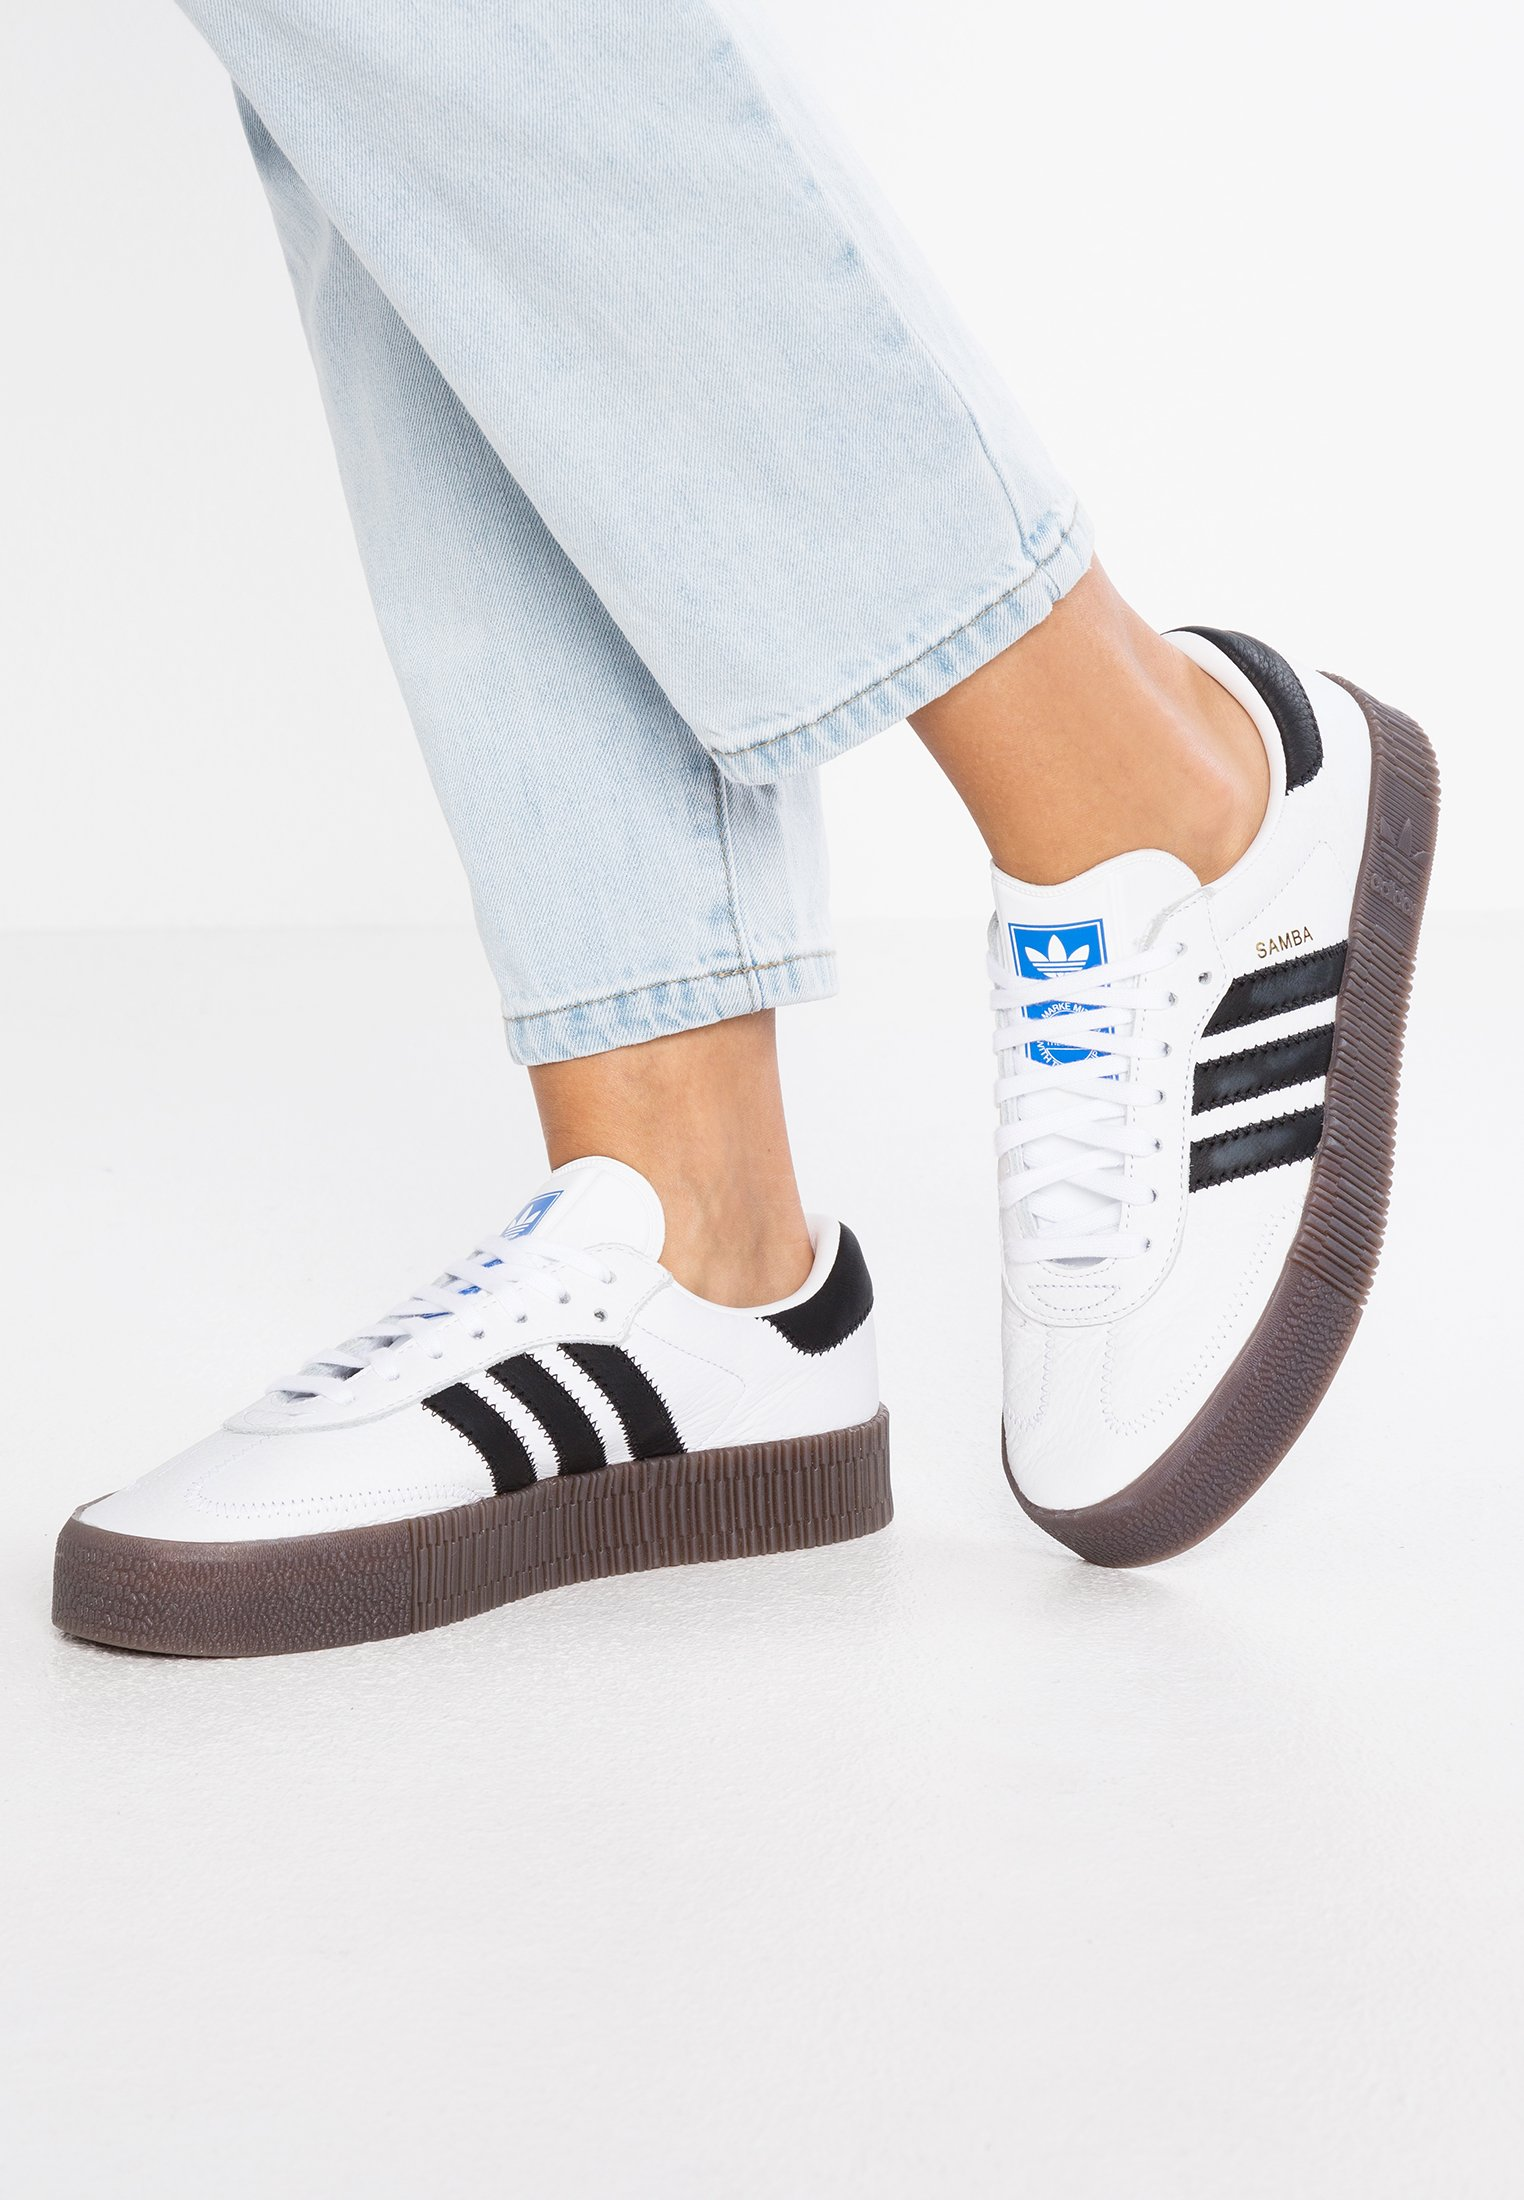 toque Ejecución Prosperar  adidas Originals SAMBAROSE - Trainers - footwear white/core black/white -  Zalando.co.uk